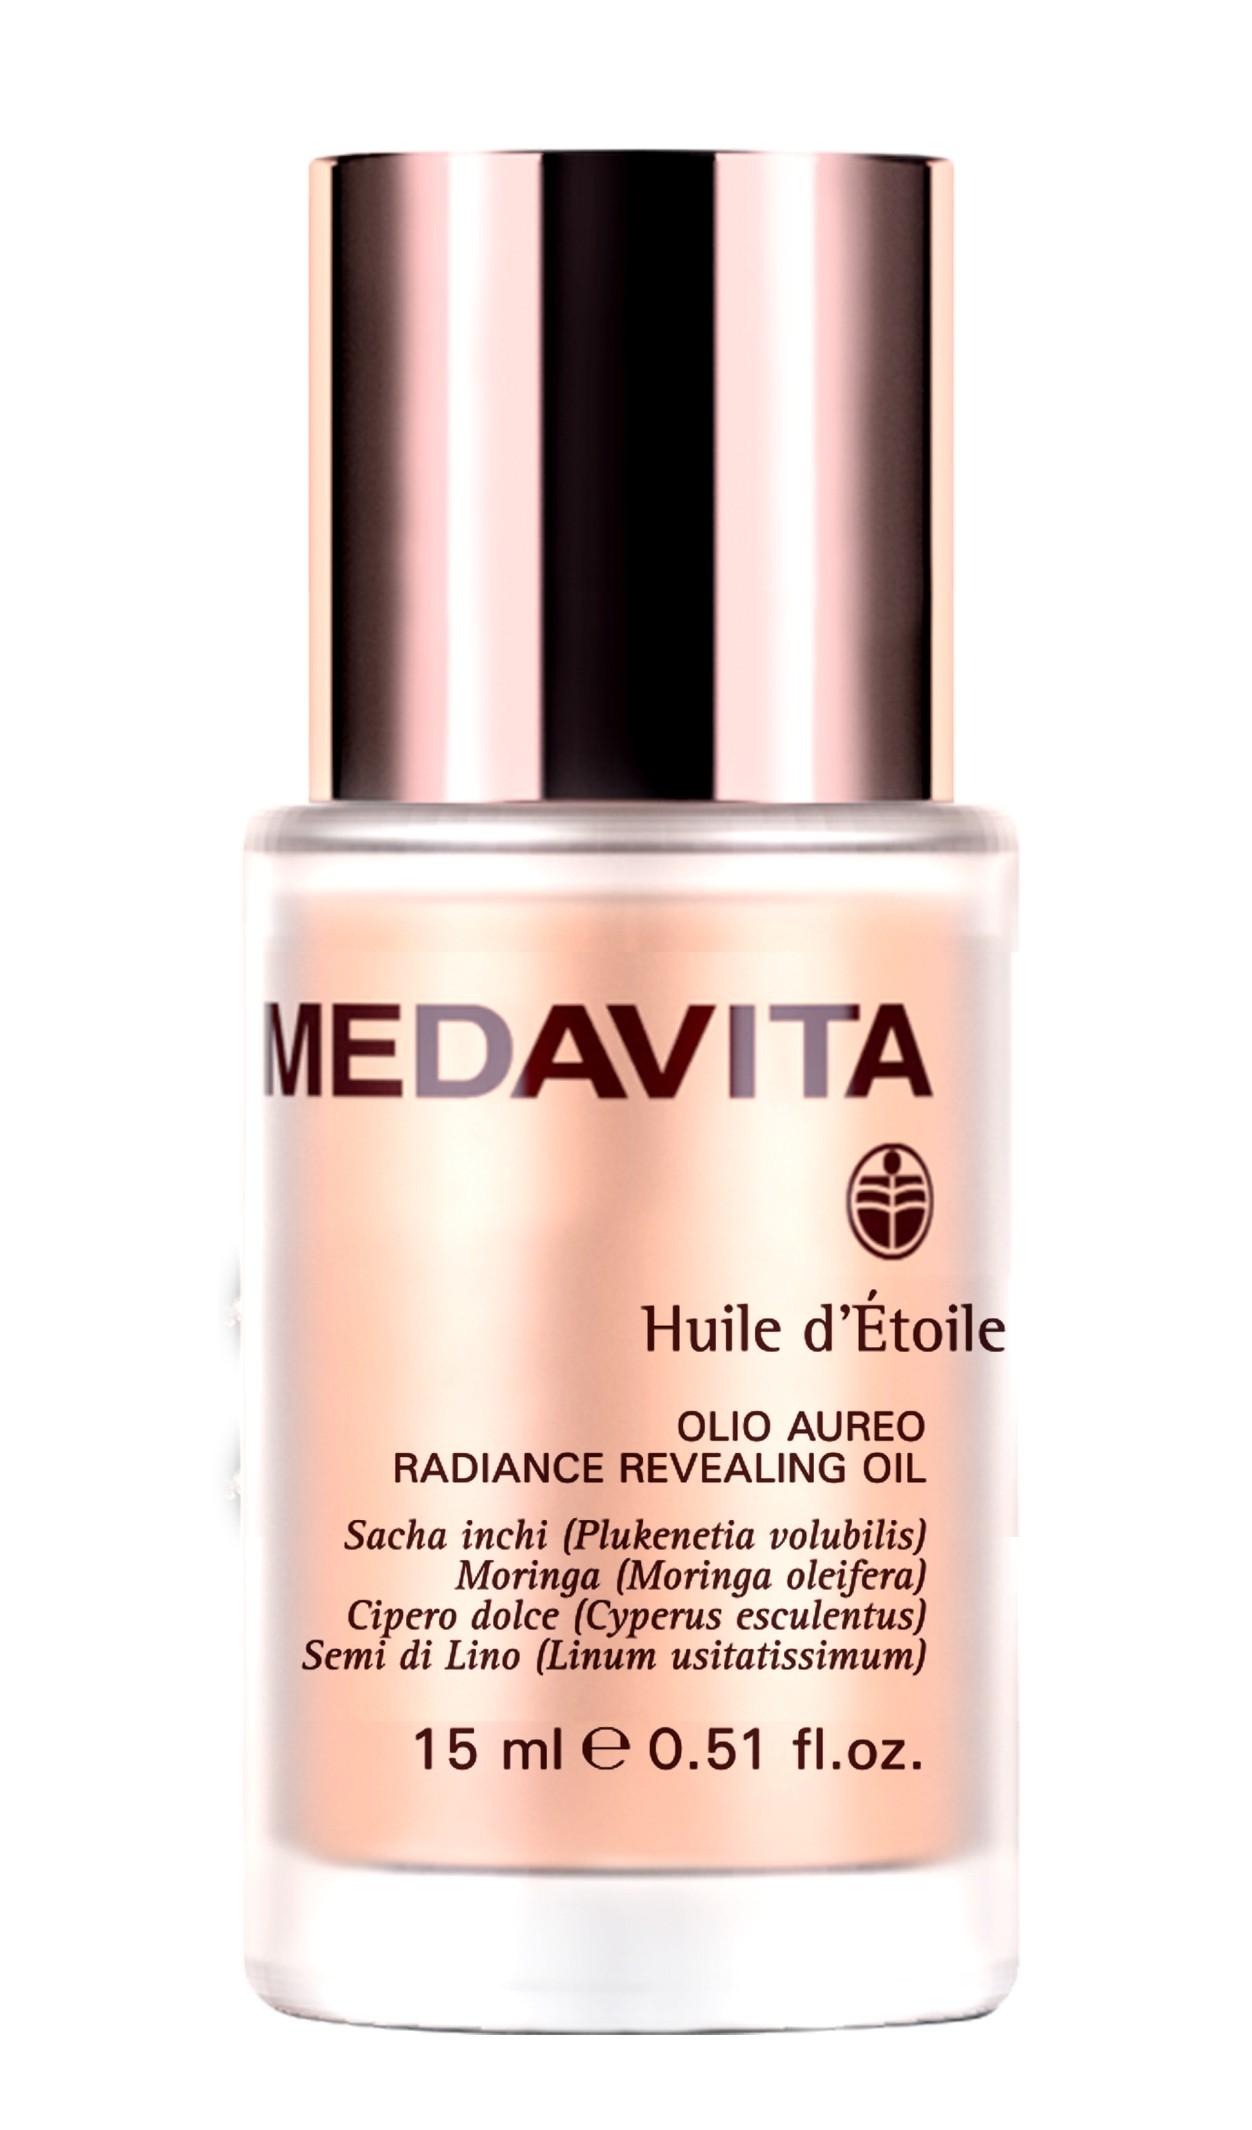 Антиоксидантное масло с эффектом шелка Huile d'Etoile Medavita Италия 50 мл(р) — фото №1